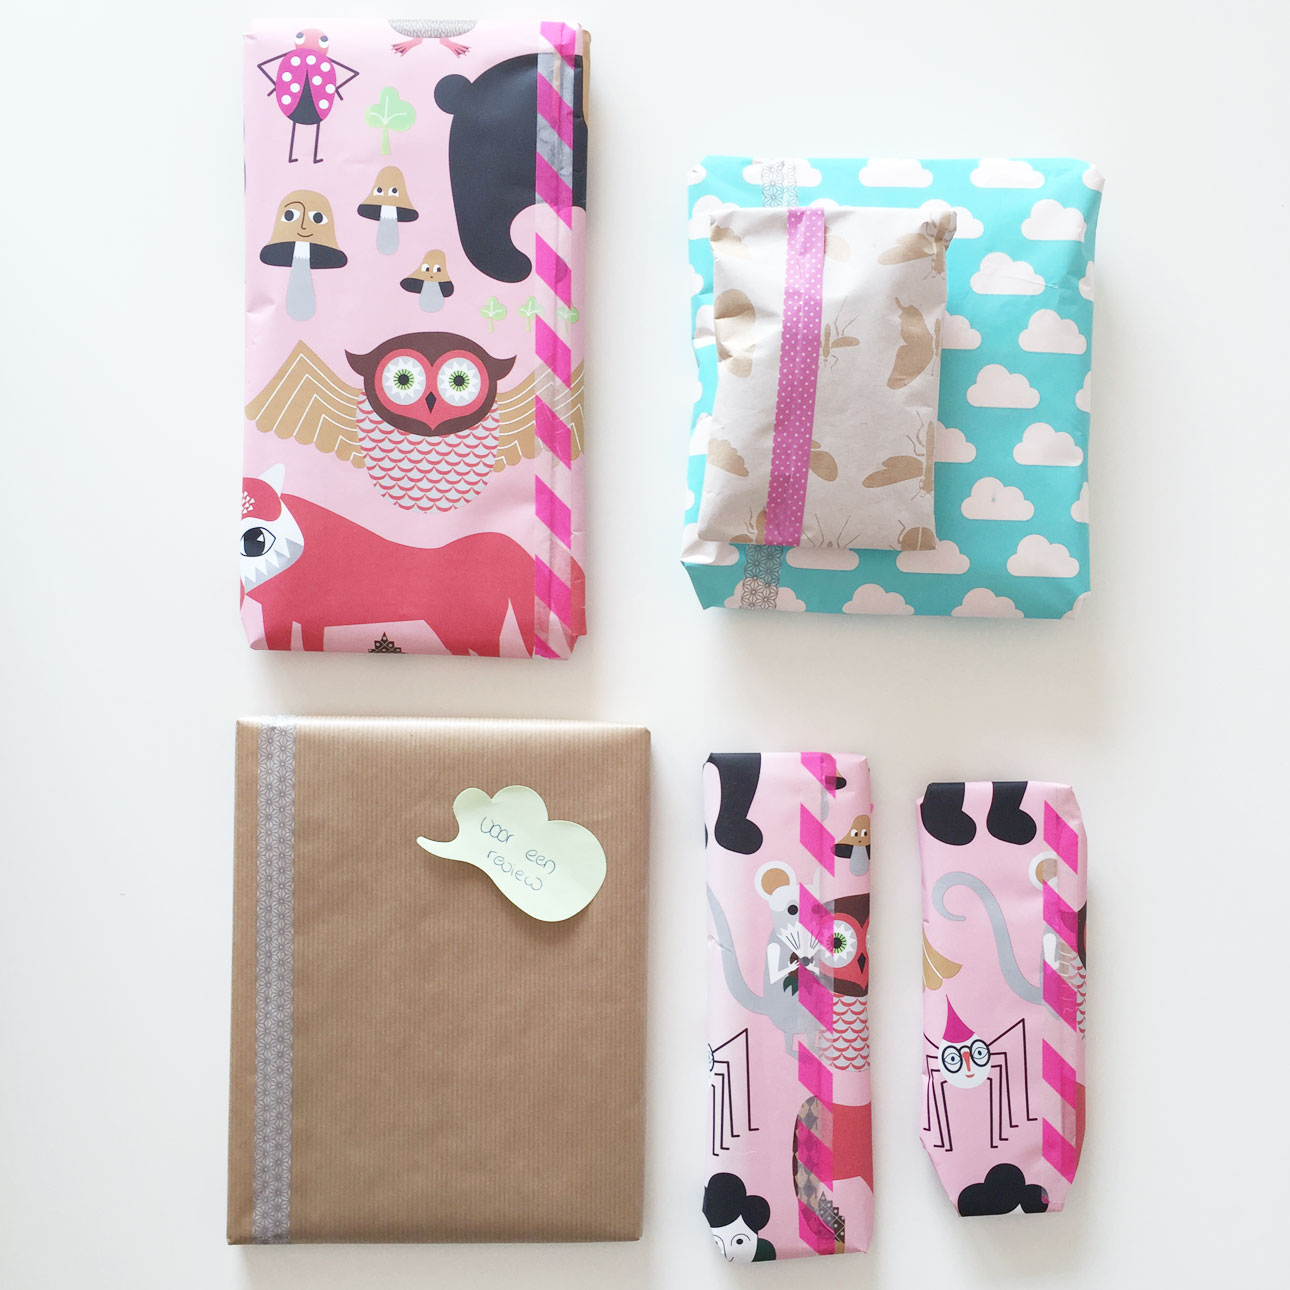 Mamalifestyle Marike augustus 2015 cadeautjes inpakken